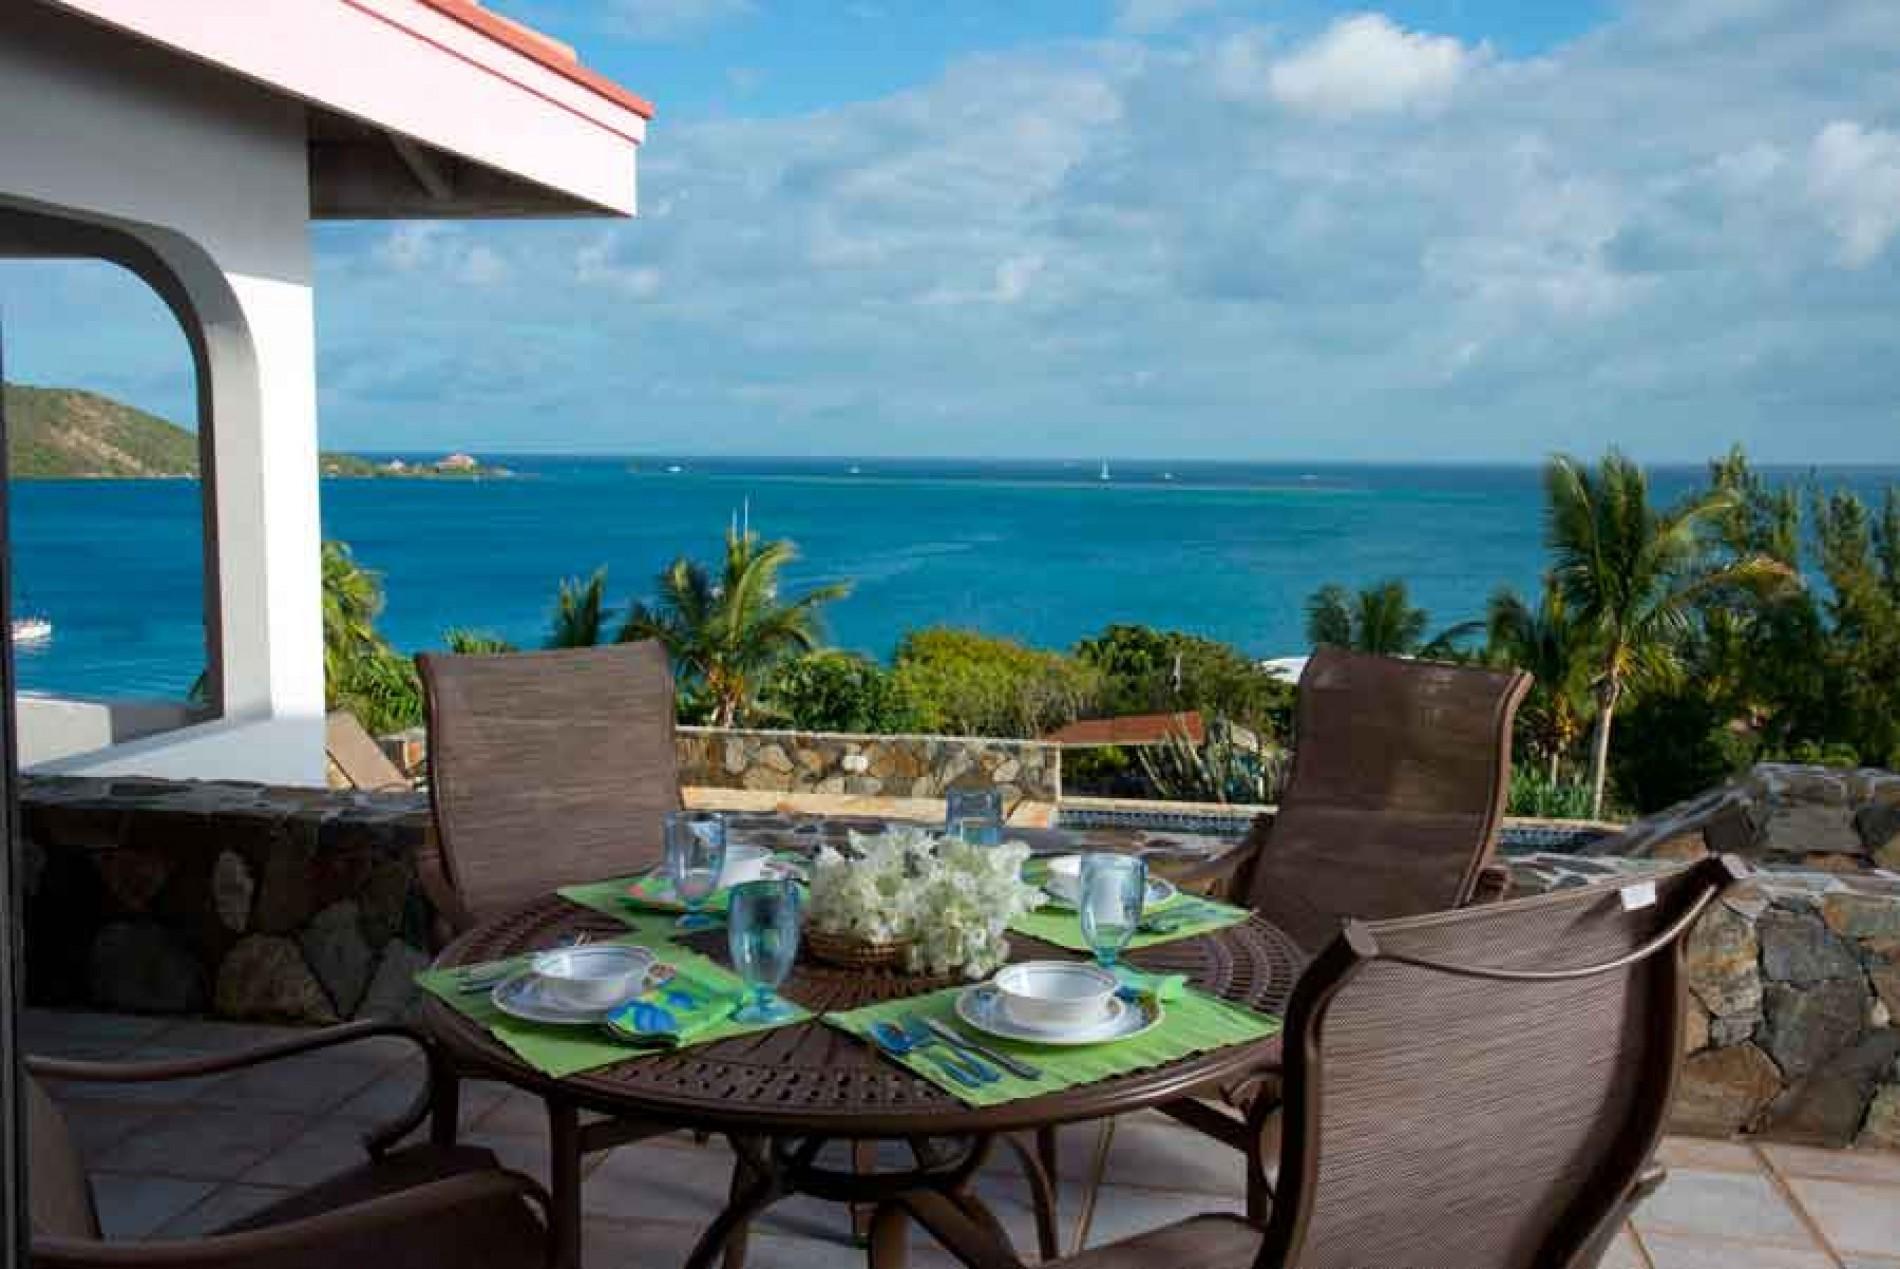 spyglass villa - 3 bedrooms - ocean views